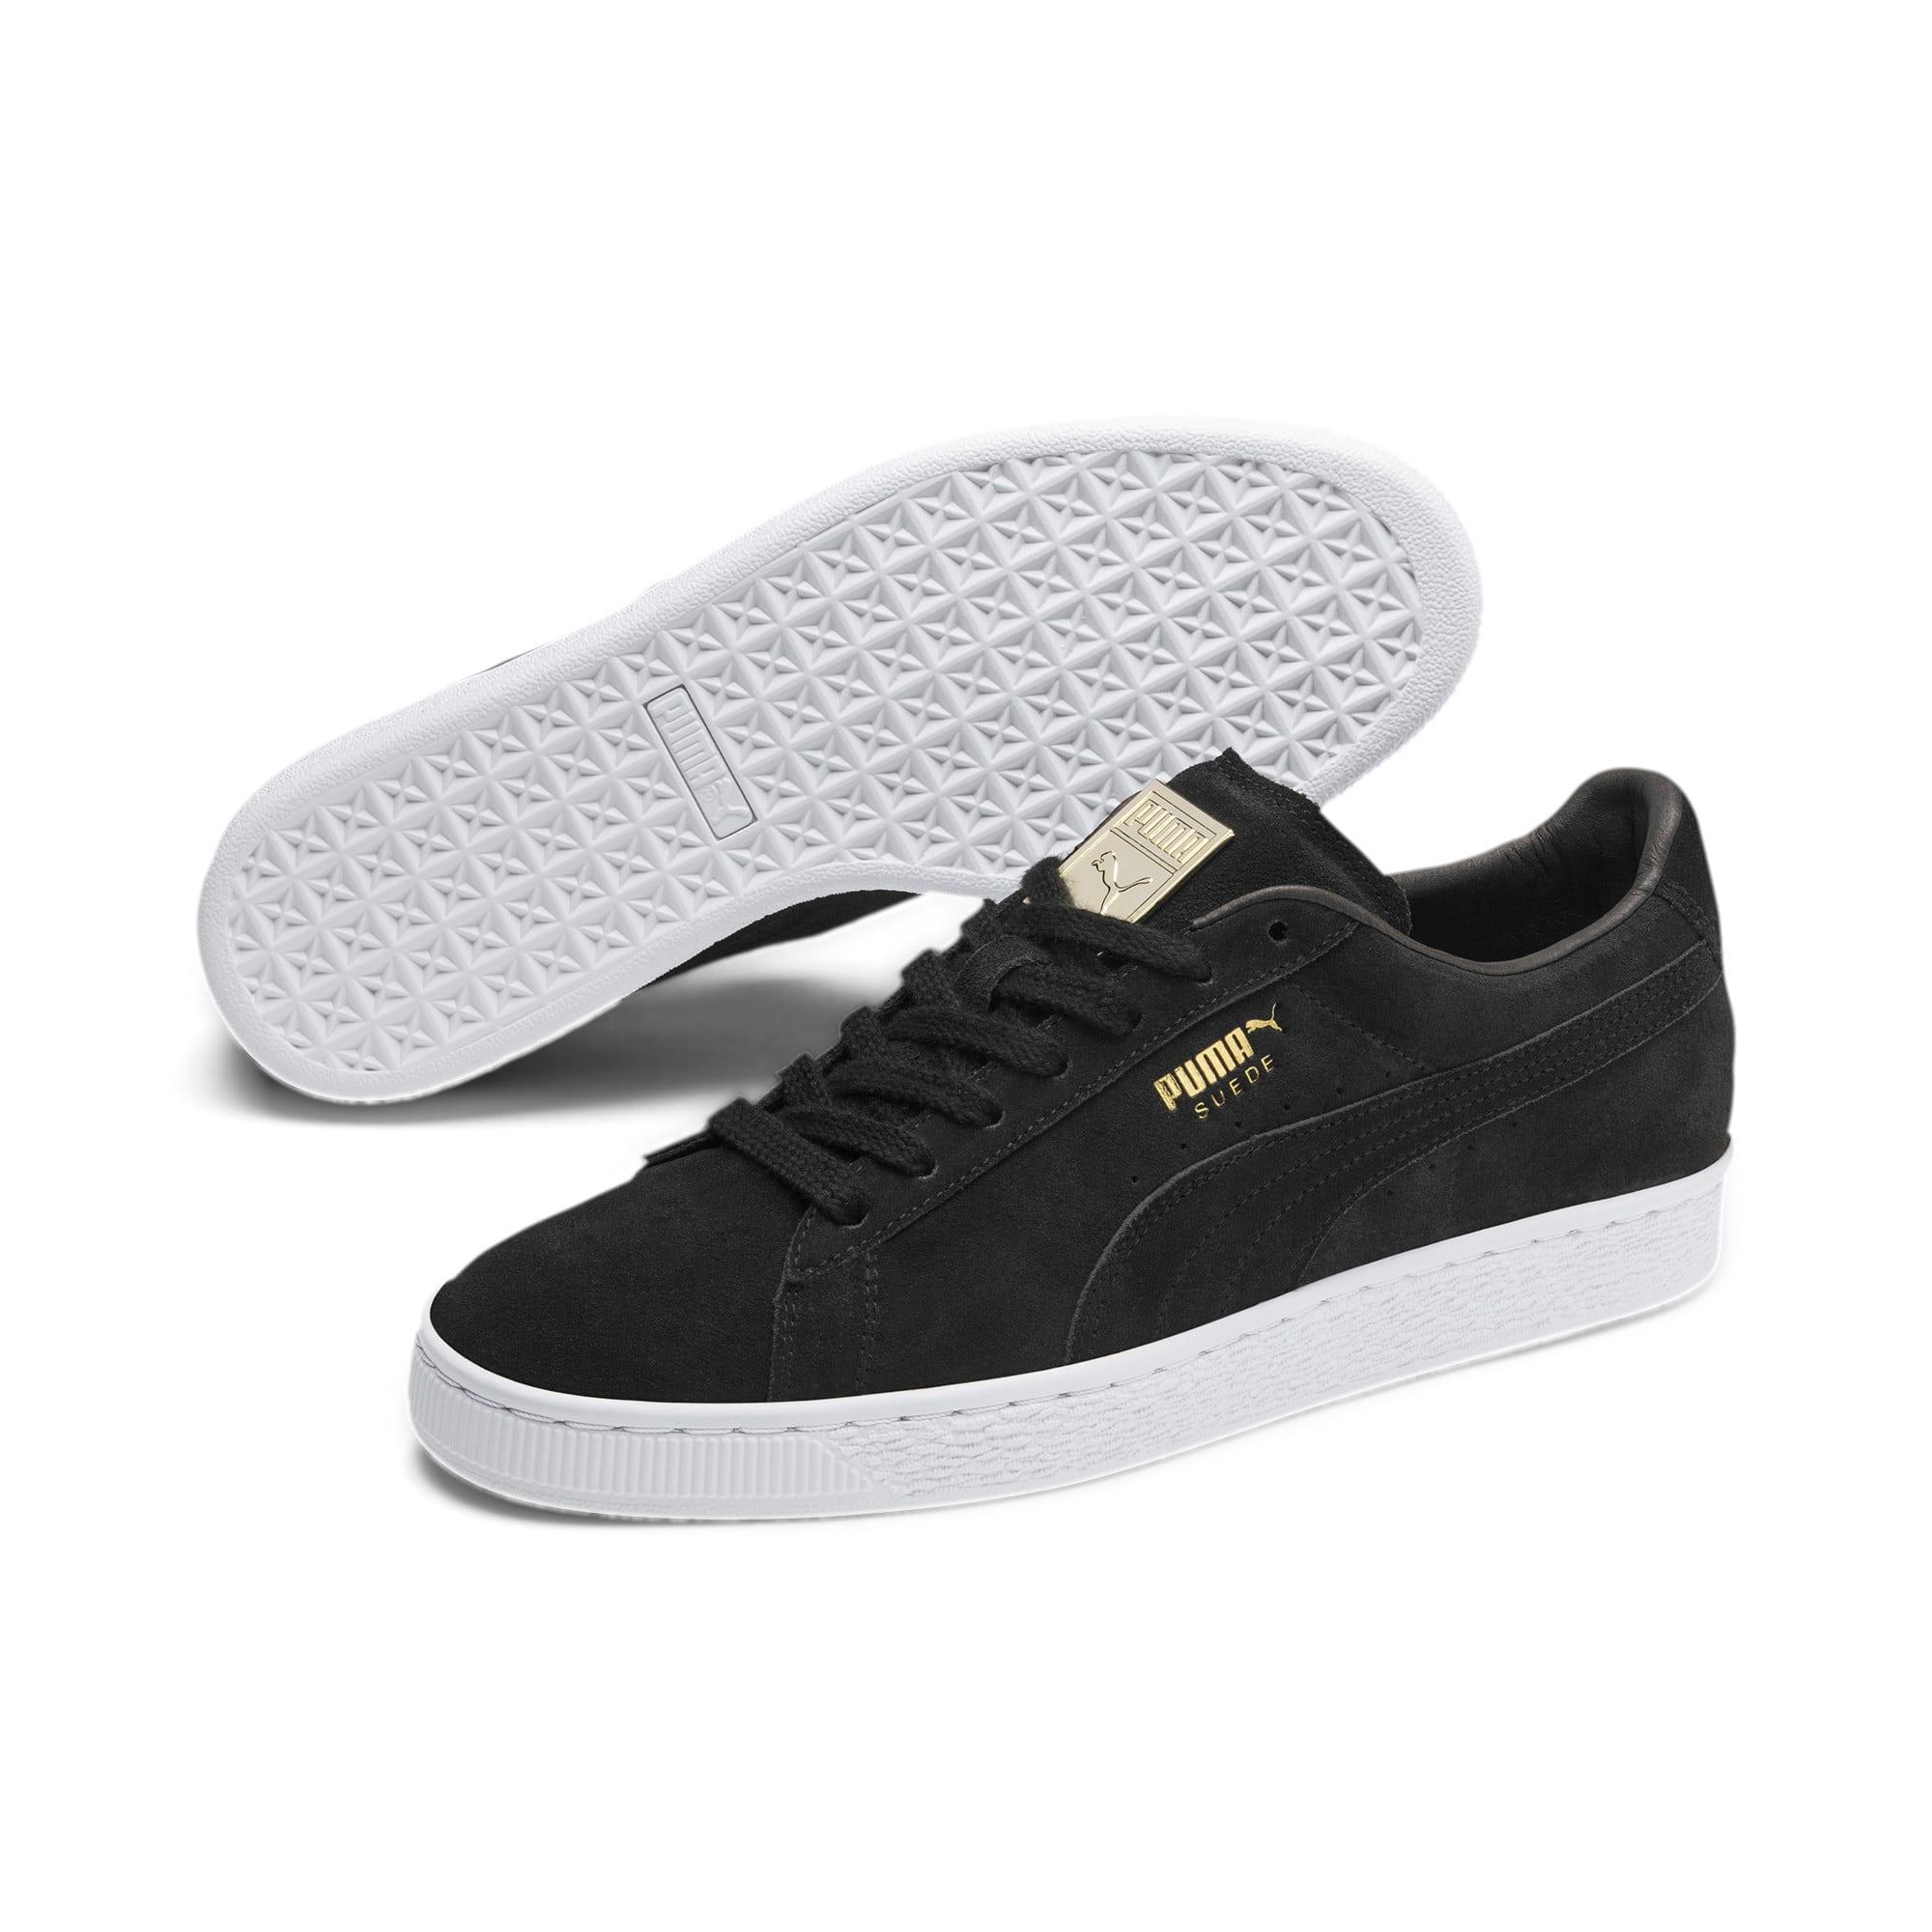 Thumbnail 3 of Suede Classic Metal Badge Sneakers, Puma Black-Puma White, medium